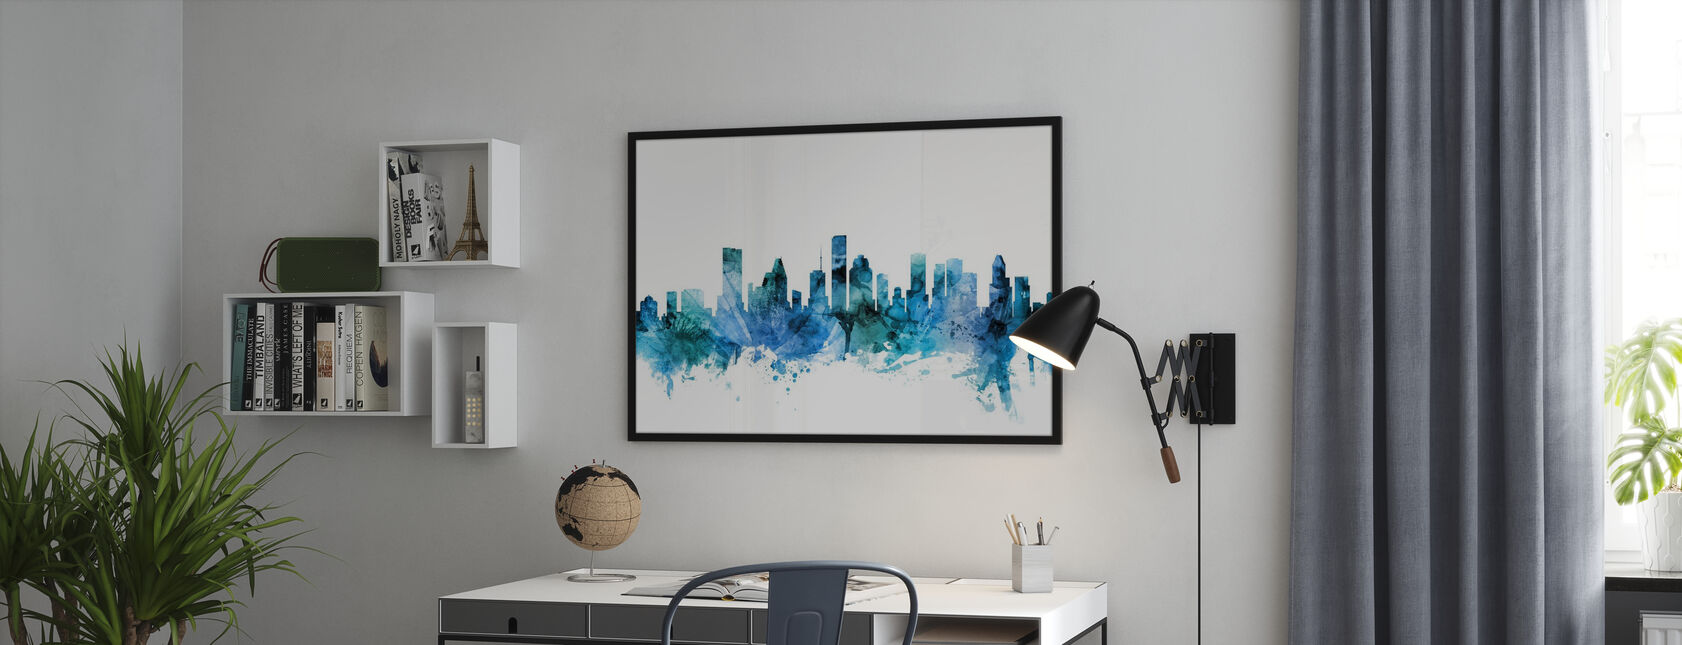 Houston Texas Skyline - Plakat - Kontor